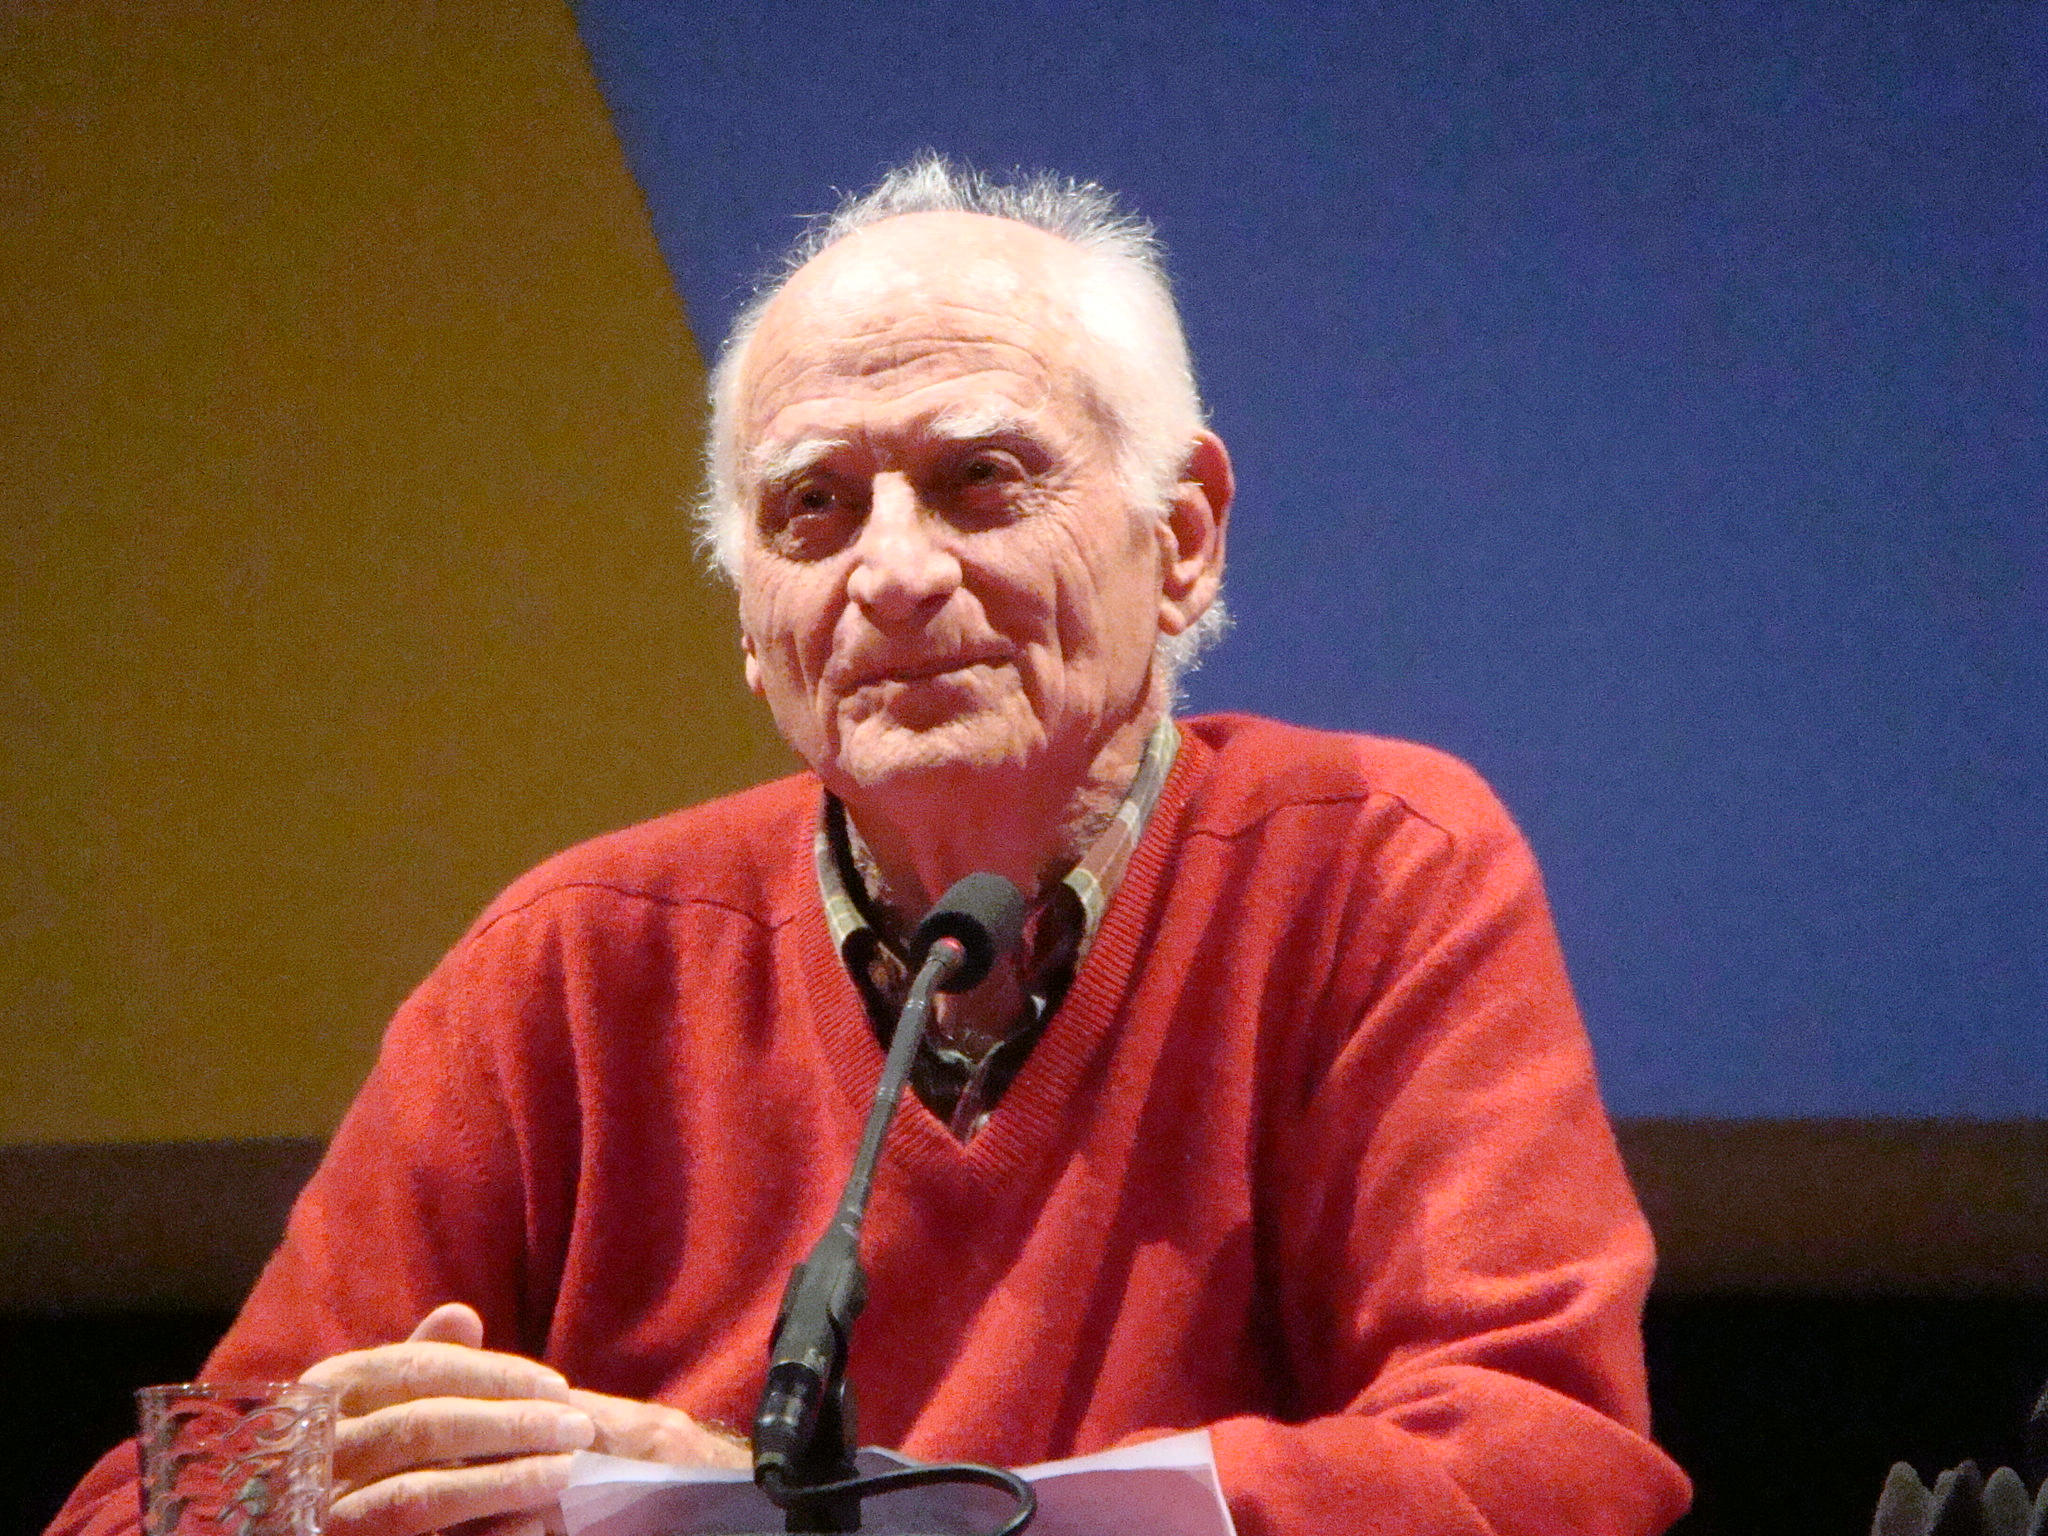 https://upload.wikimedia.org/wikipedia/commons/b/b0/Michel_Serres_-_Espace_des_sciences_-_15-02-2011.JPG